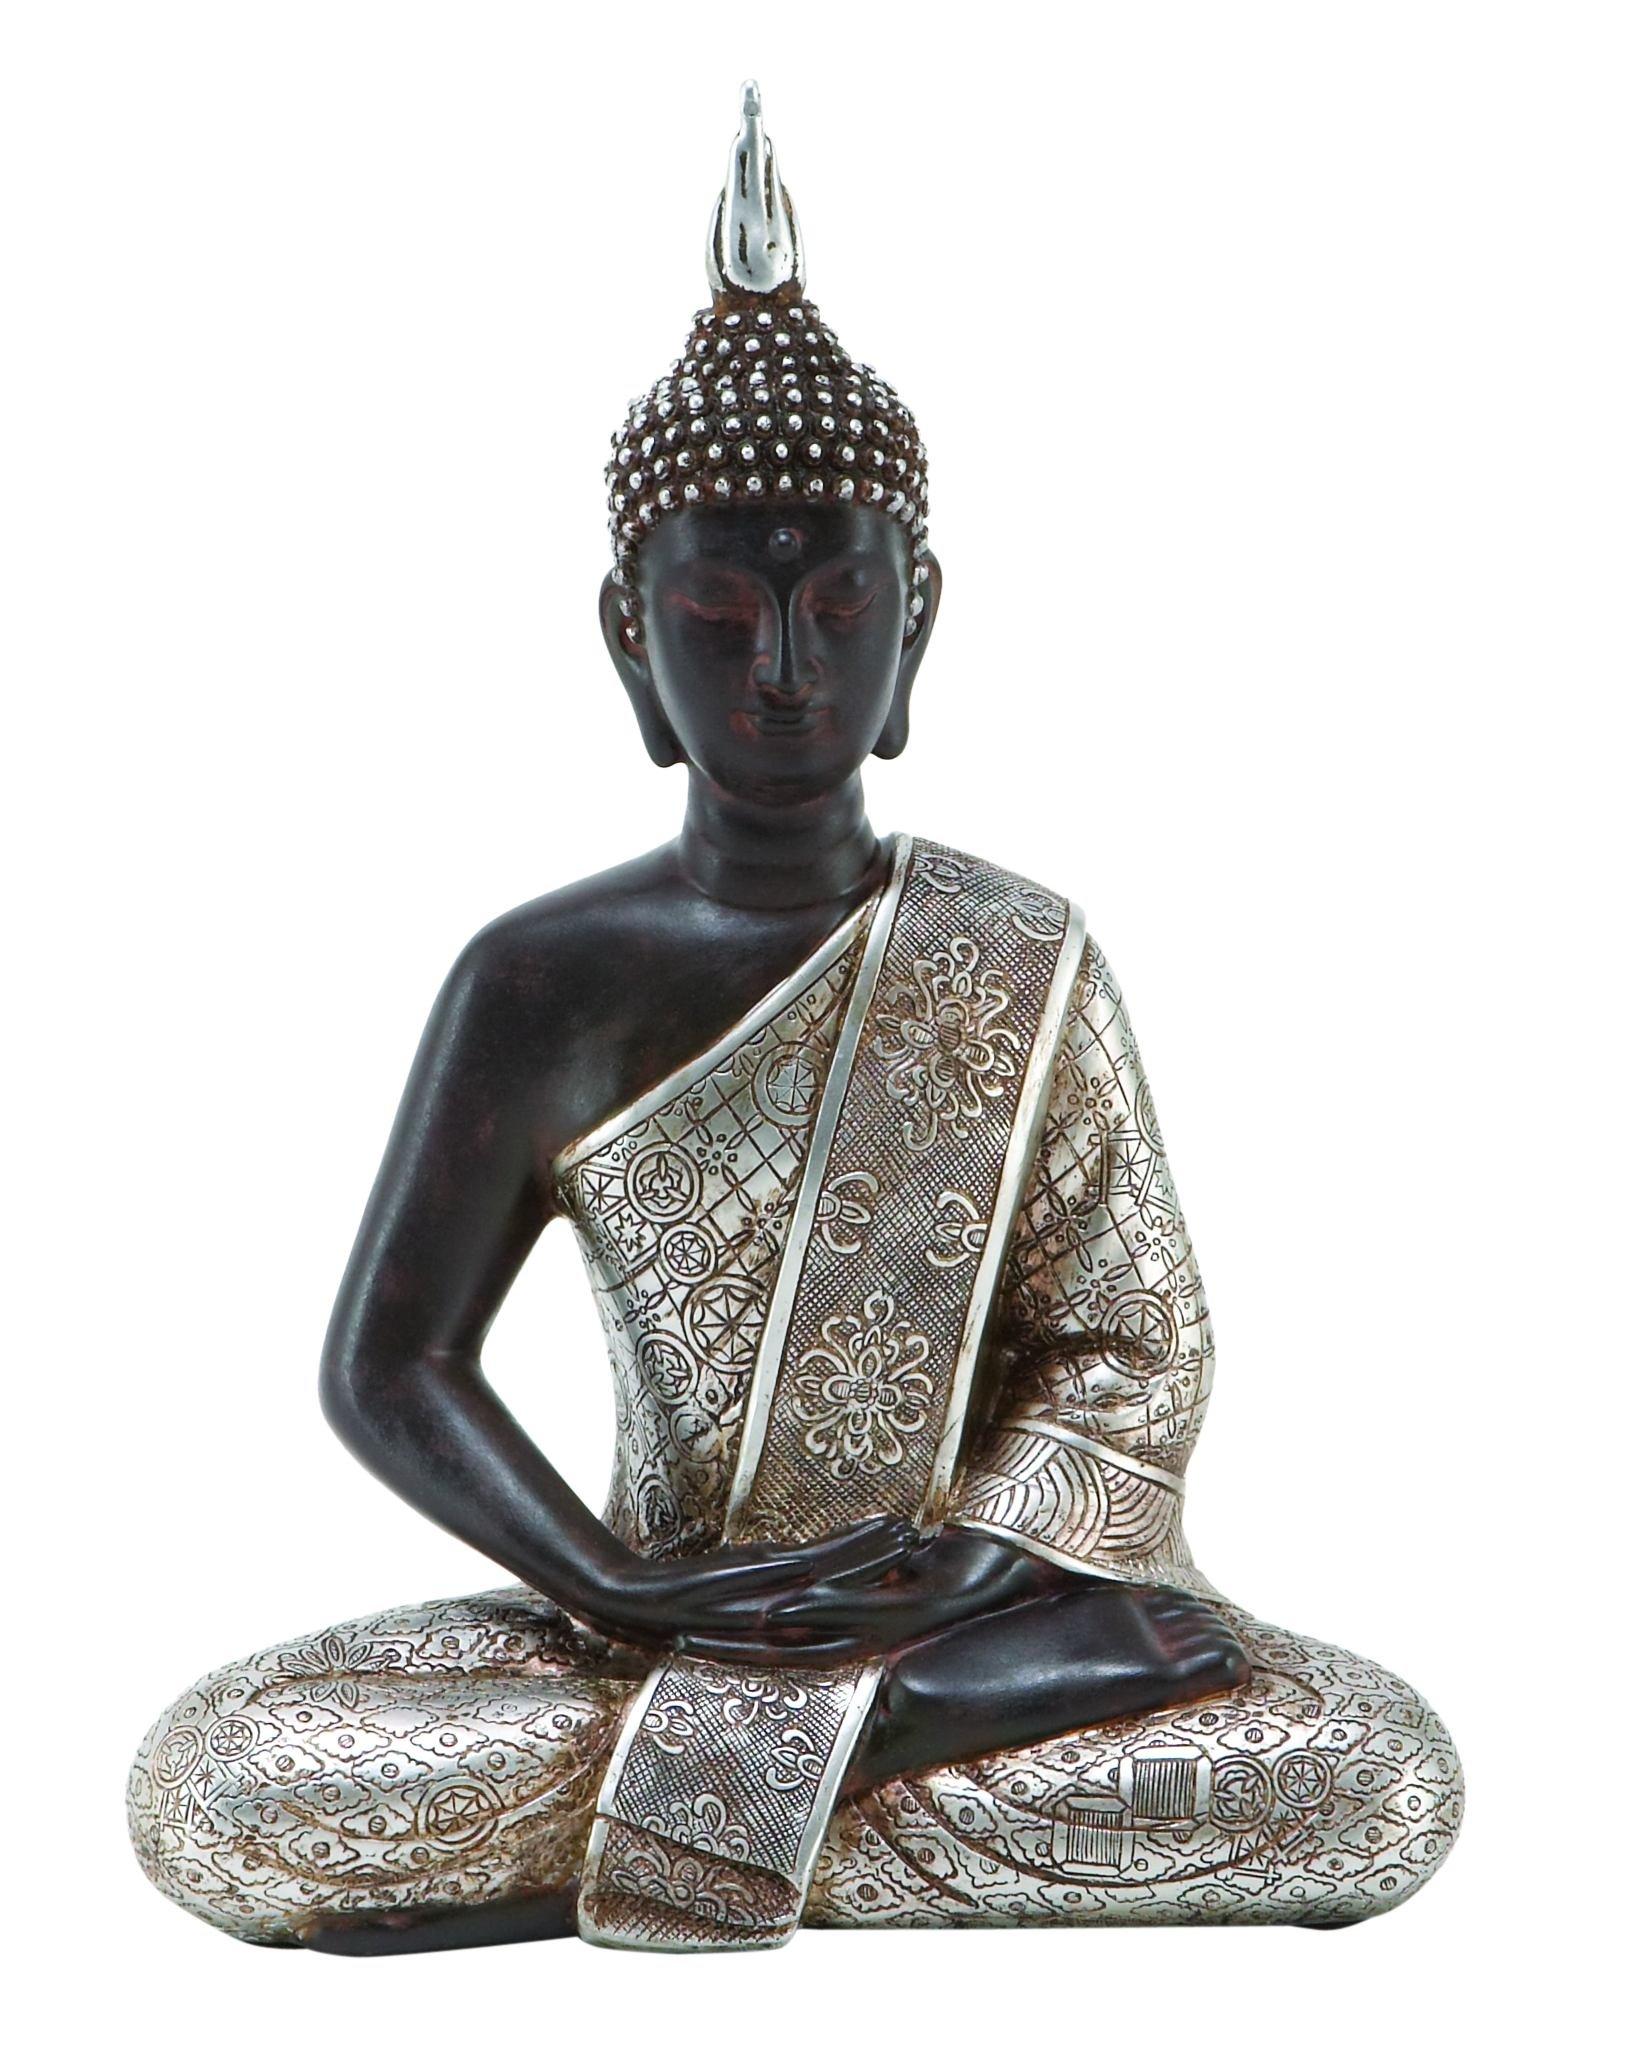 Deco 79 Tibet Buddha Dhyana Mudra Silver Robe Polyresin, 11'' H by Deco 79